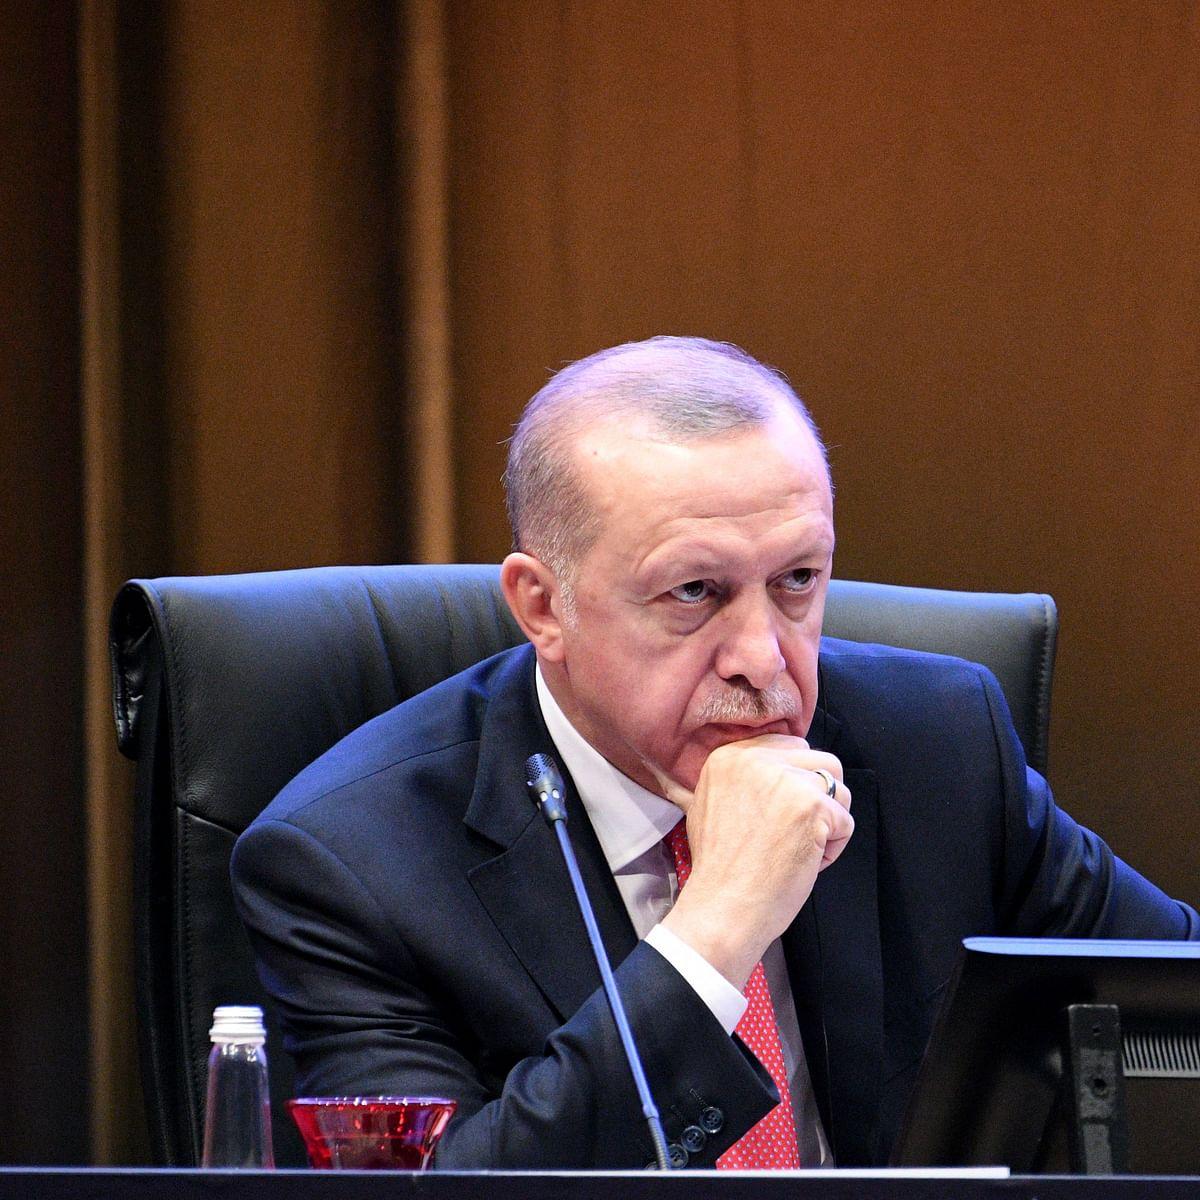 Erdogan attempts to rile up Pak Muslims over Kashmir